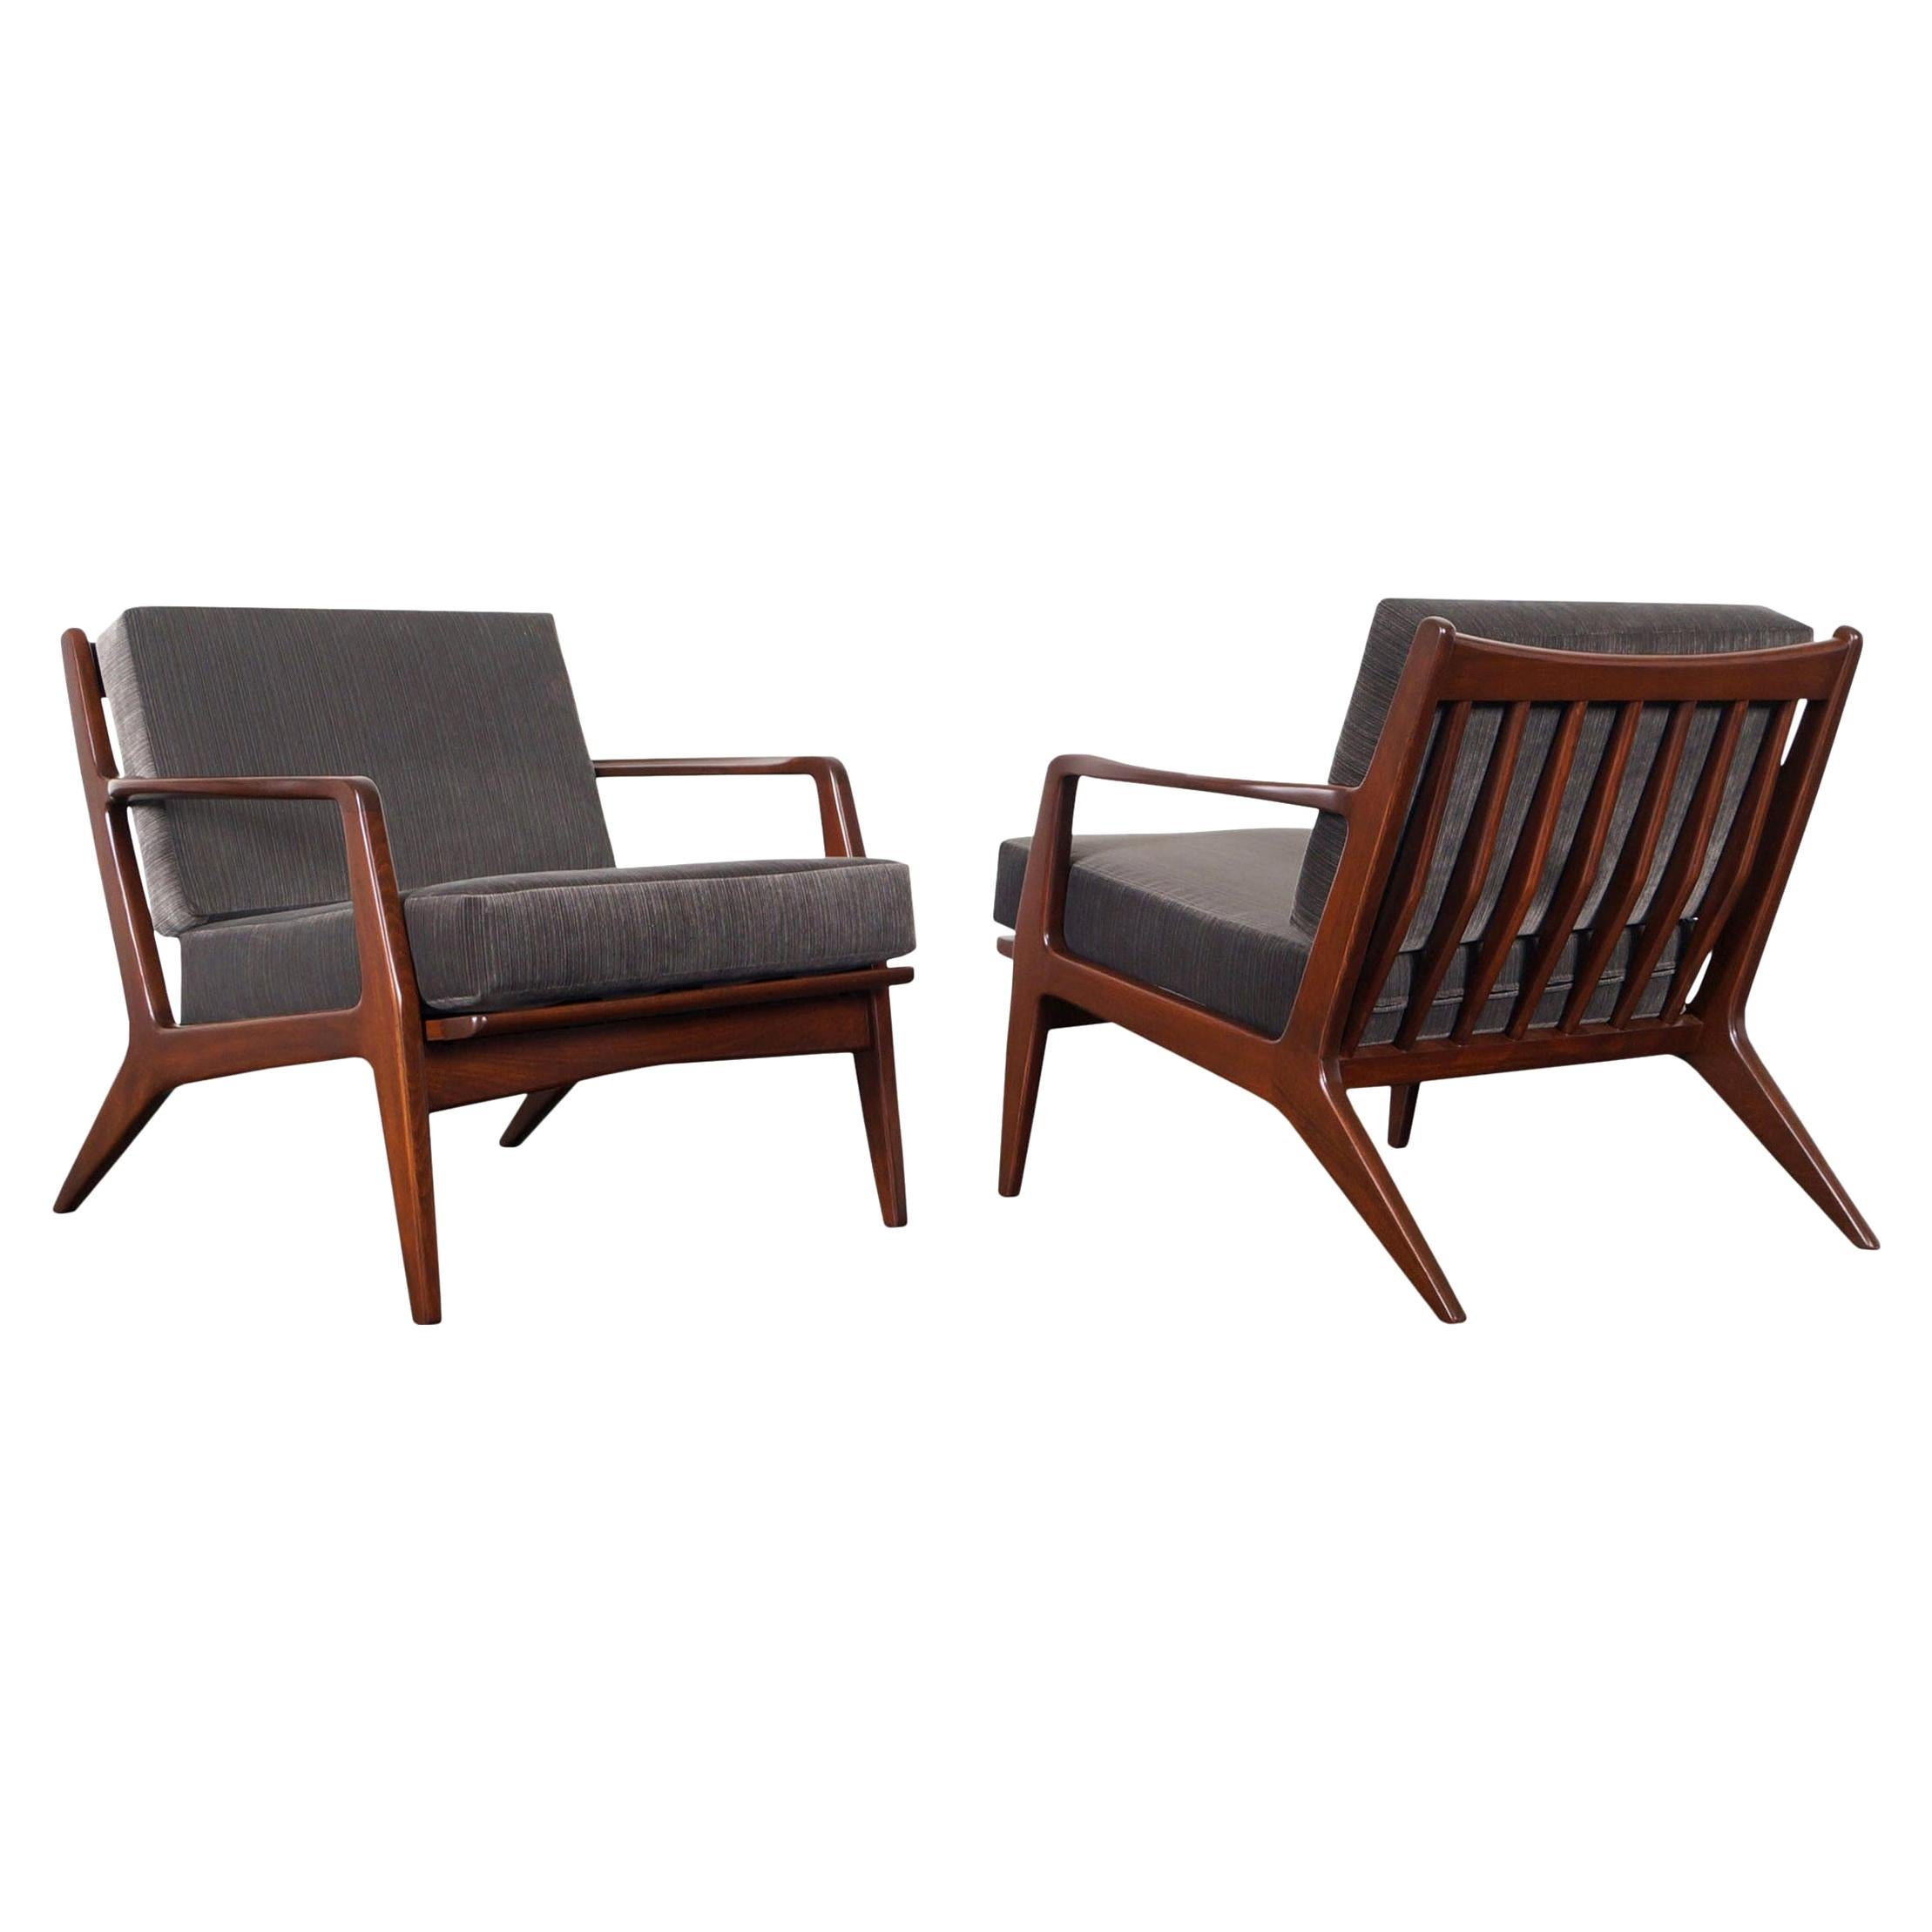 Danish Modern Walnut Lounge Chairs by Ib Kofod-Larsen